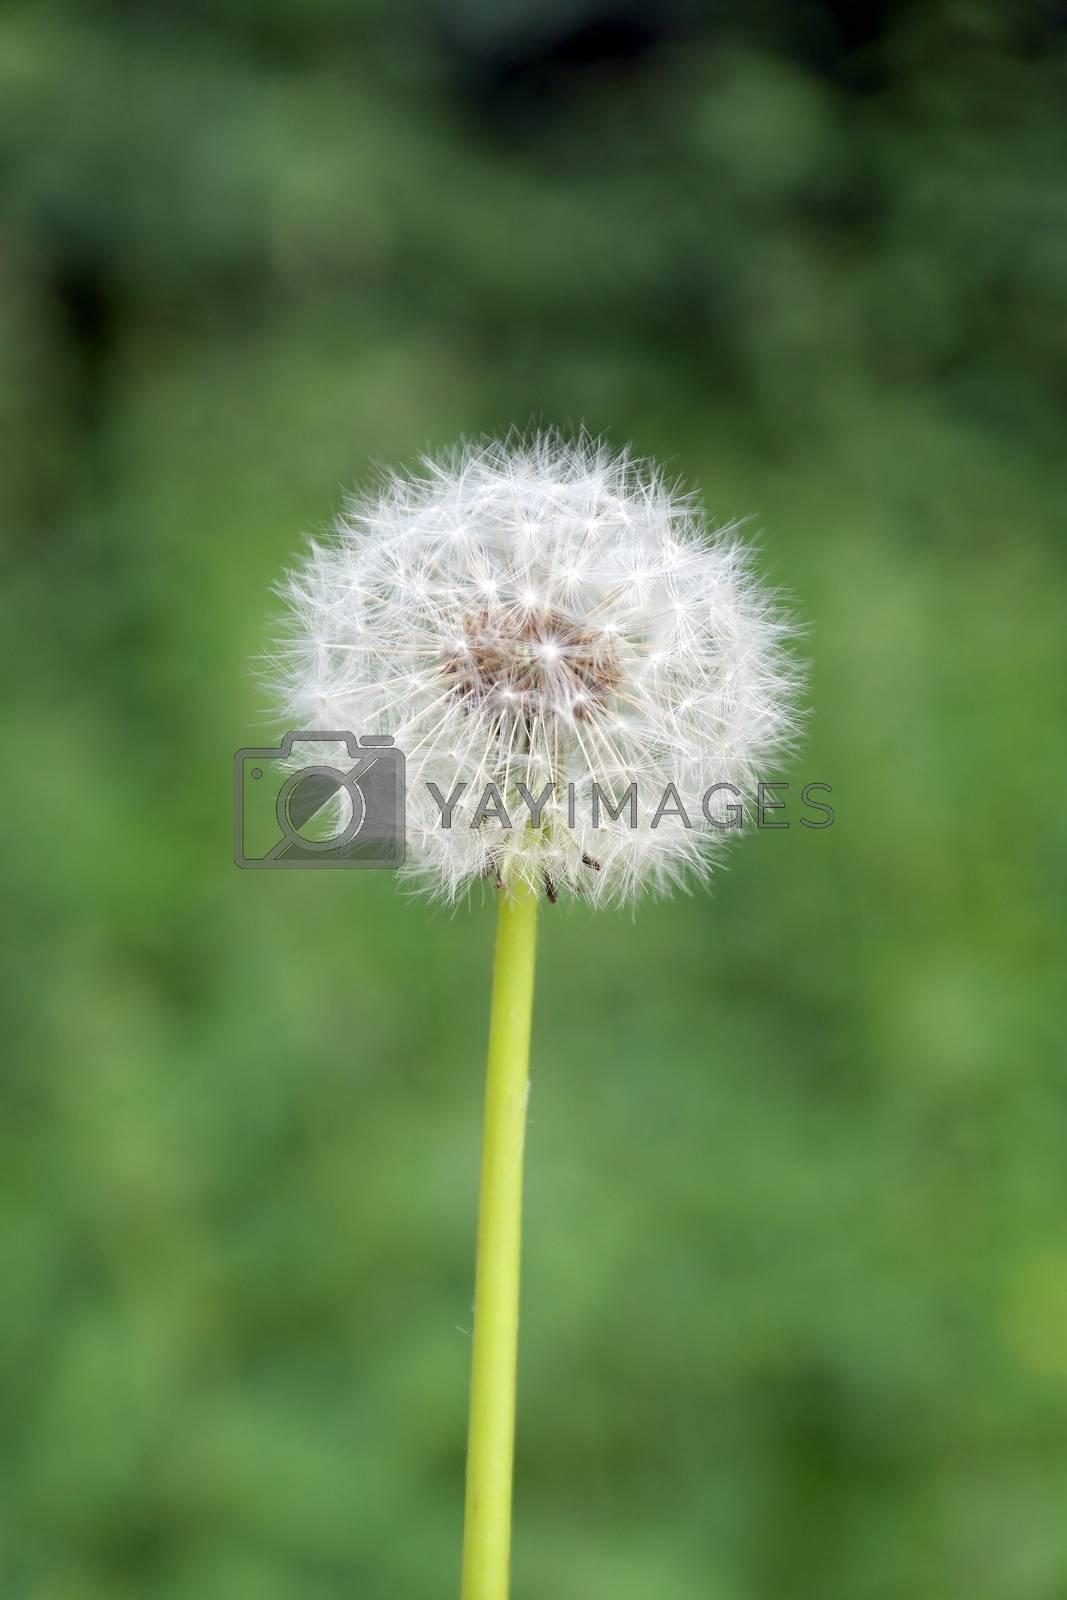 dandelion on green blurred background